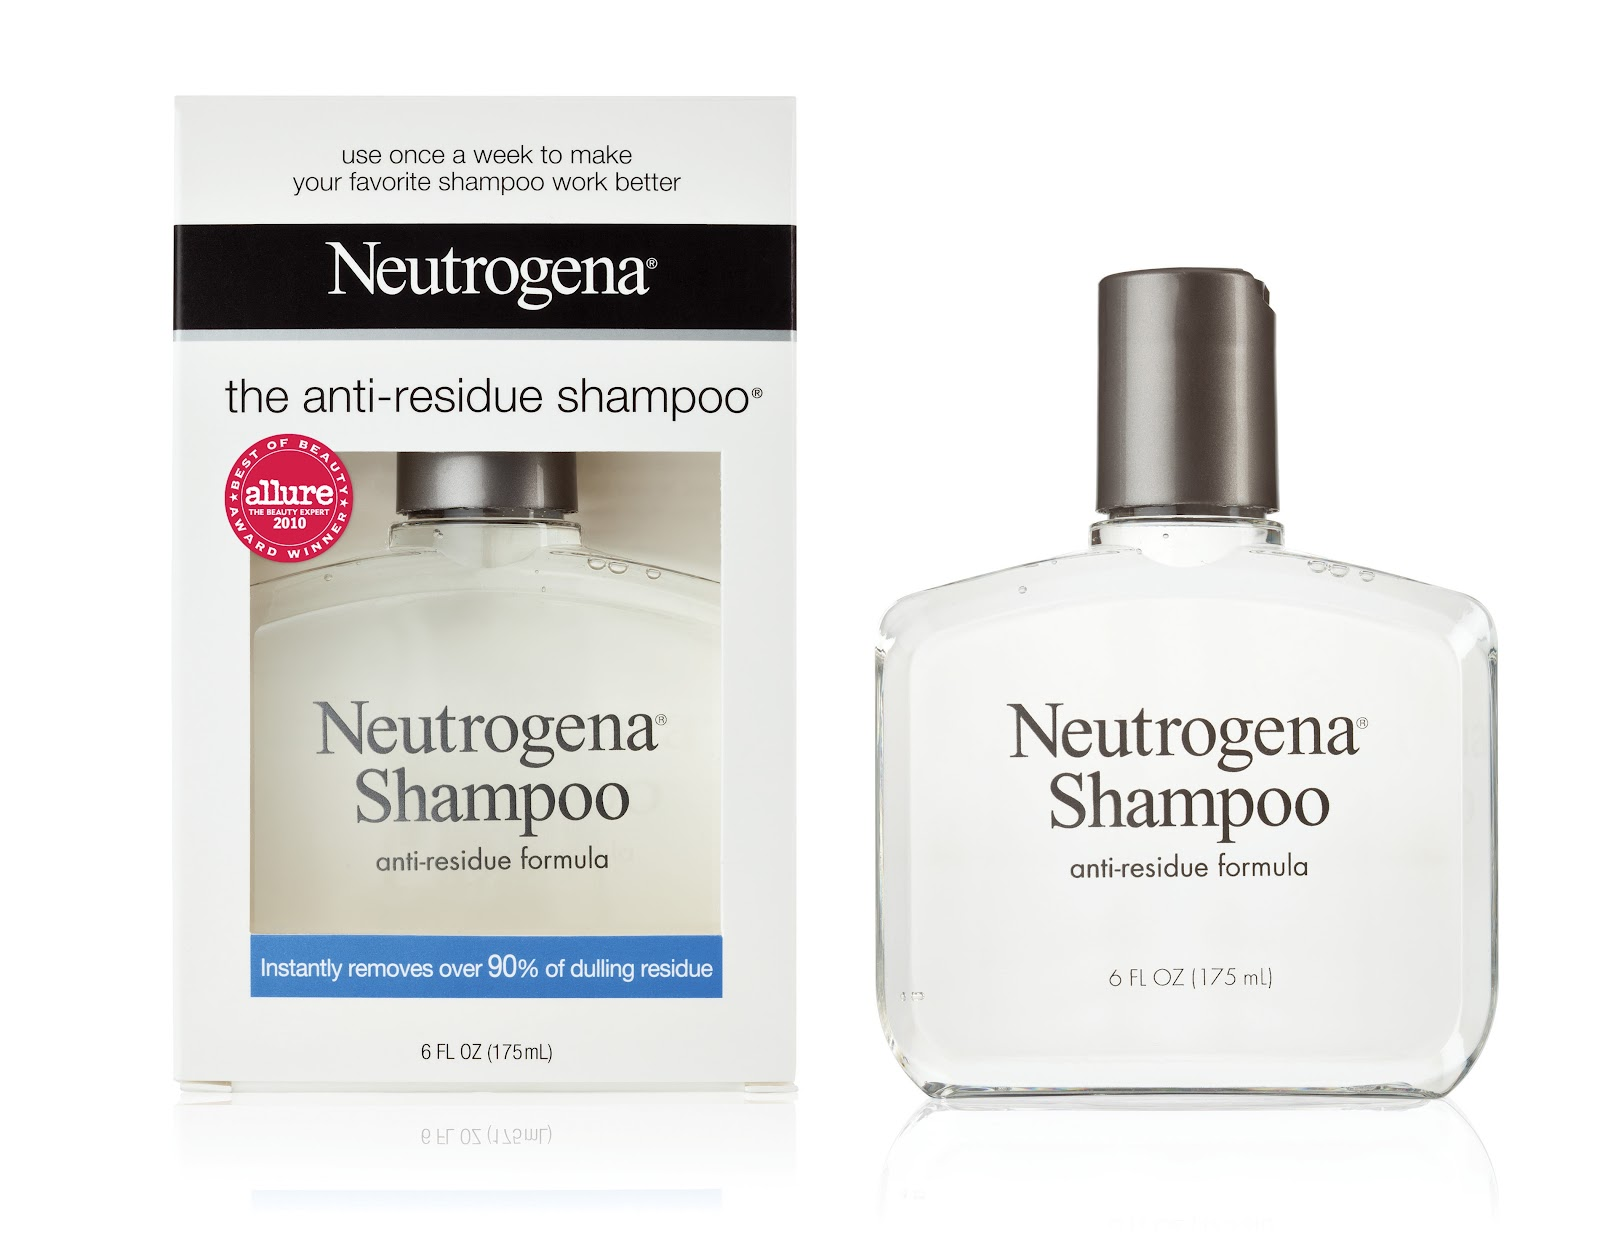 Neutrogena clear shampoo